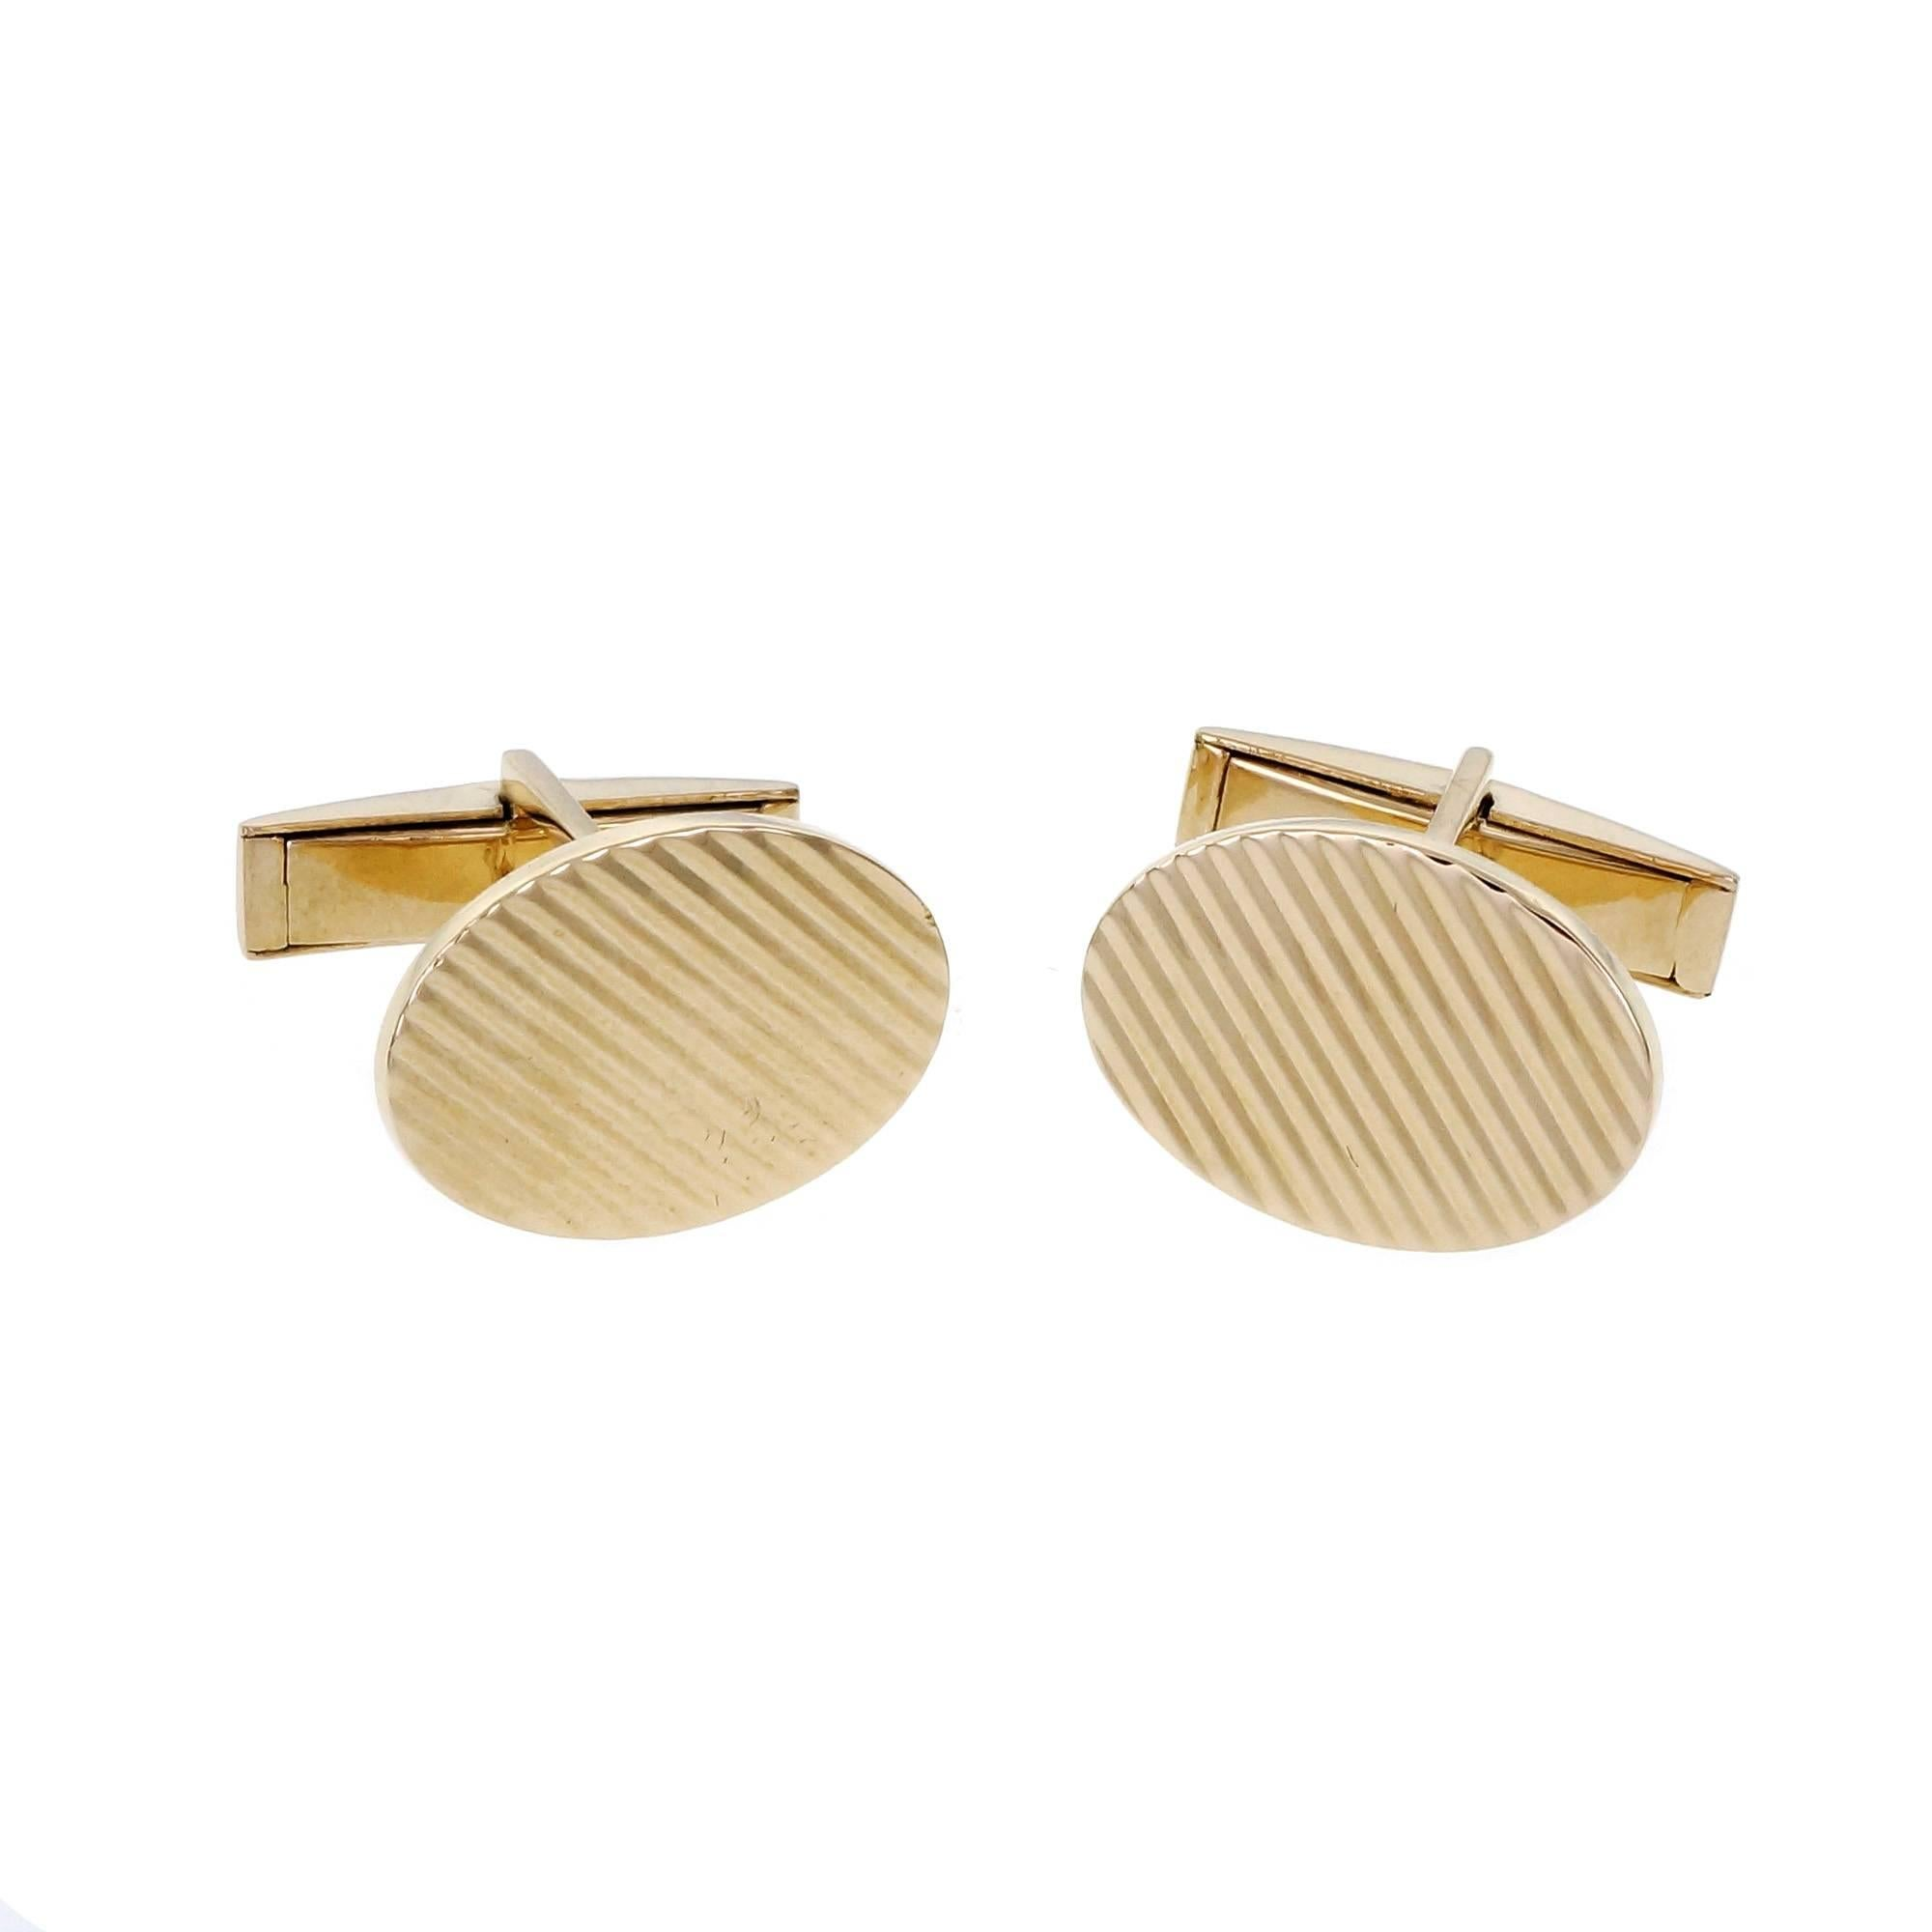 Larter & Sons Yellow Gold Cufflinks